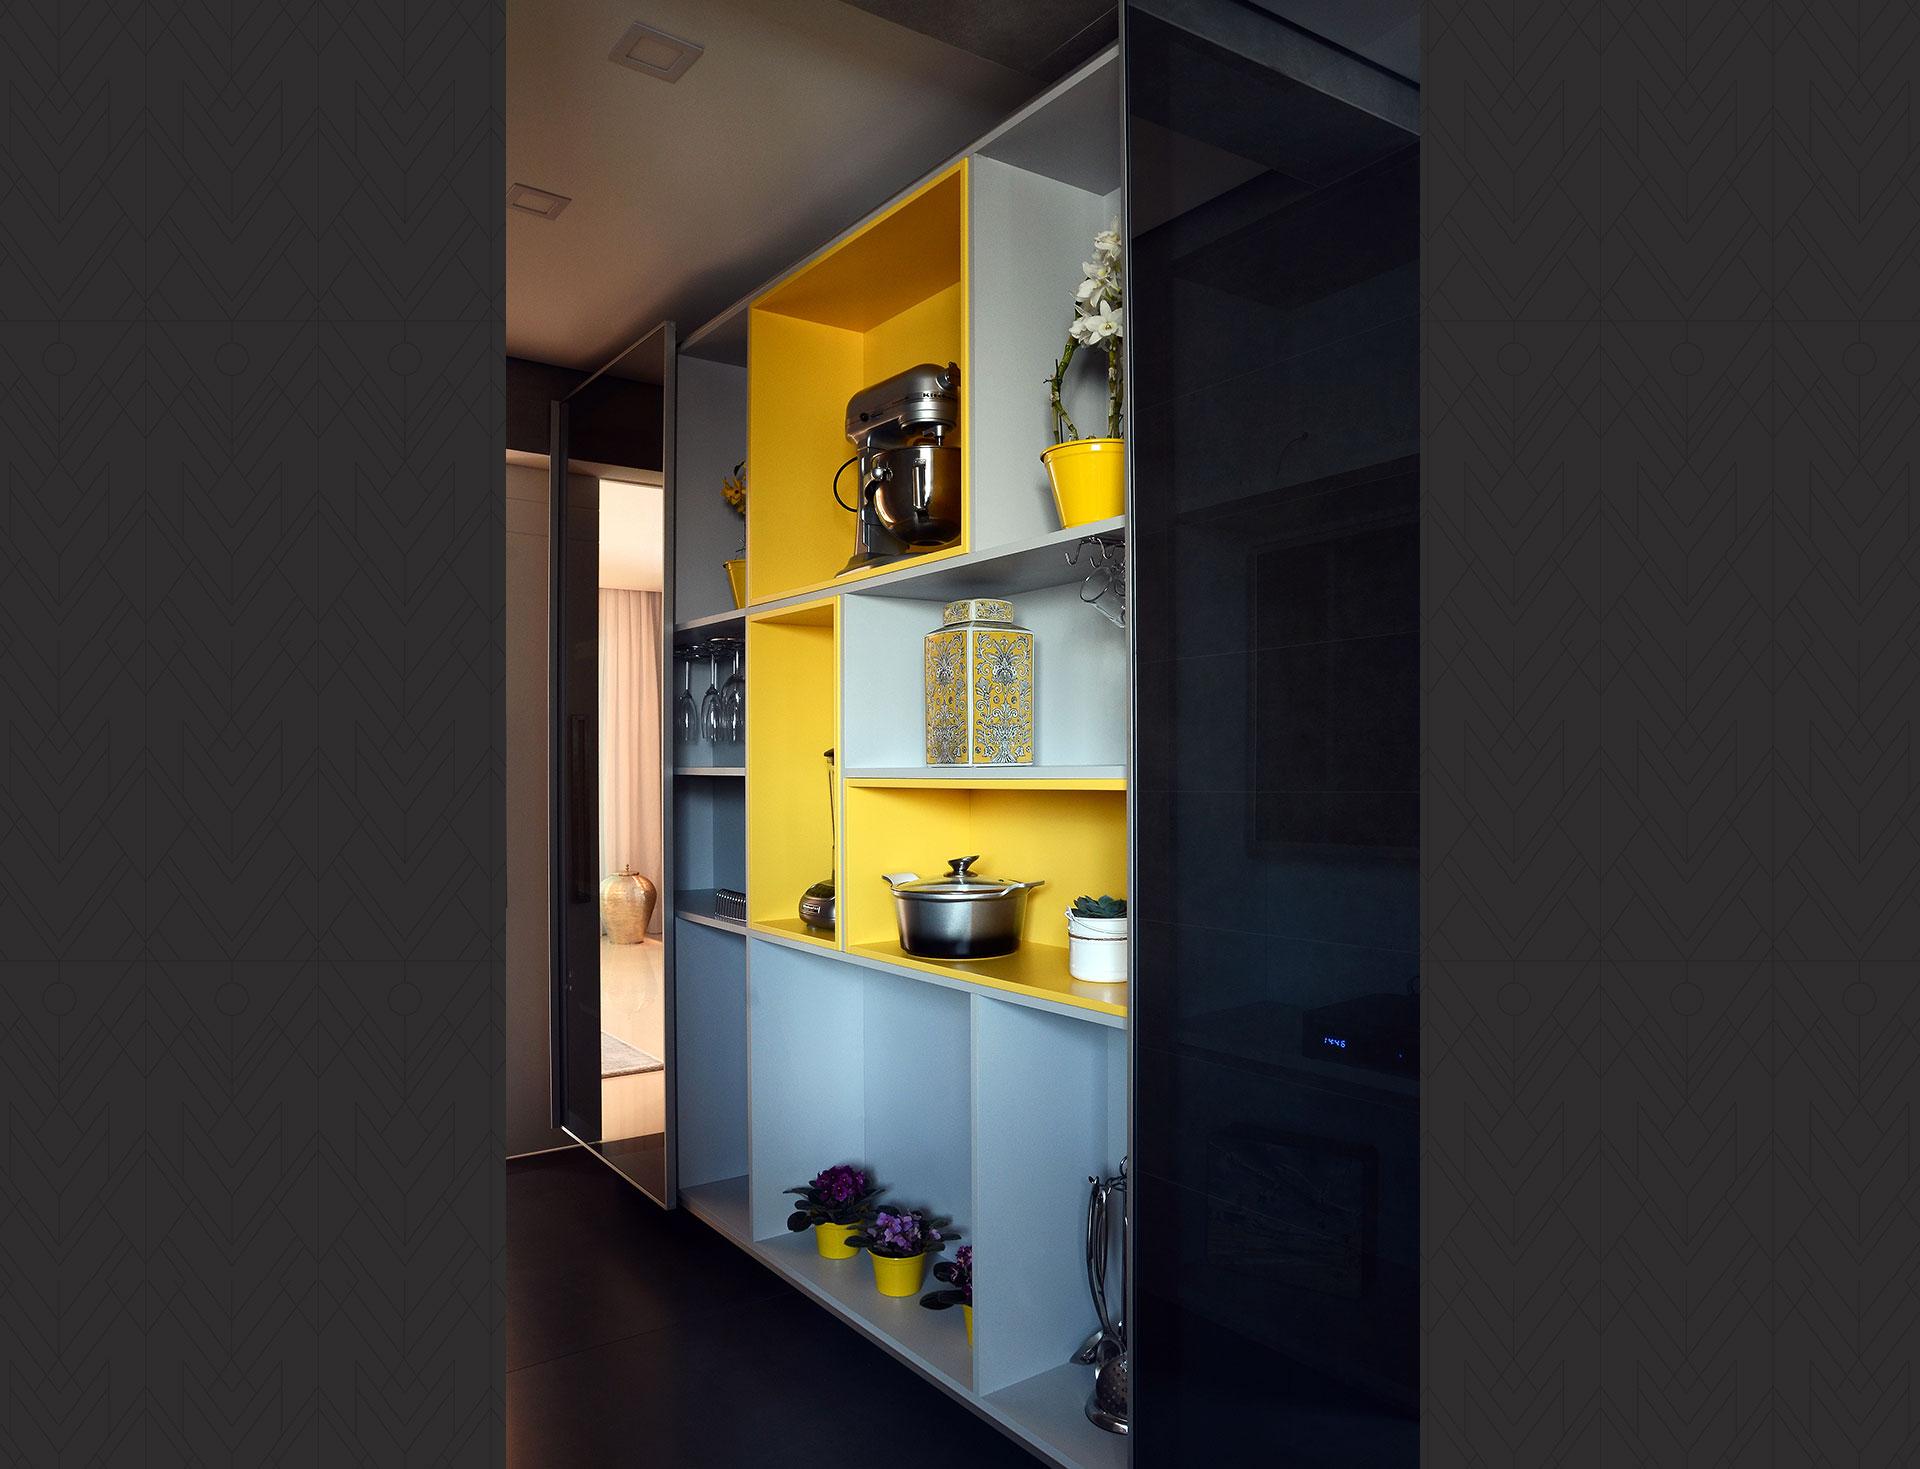 portfolio-cynthia-rolnik-apartamento1-09